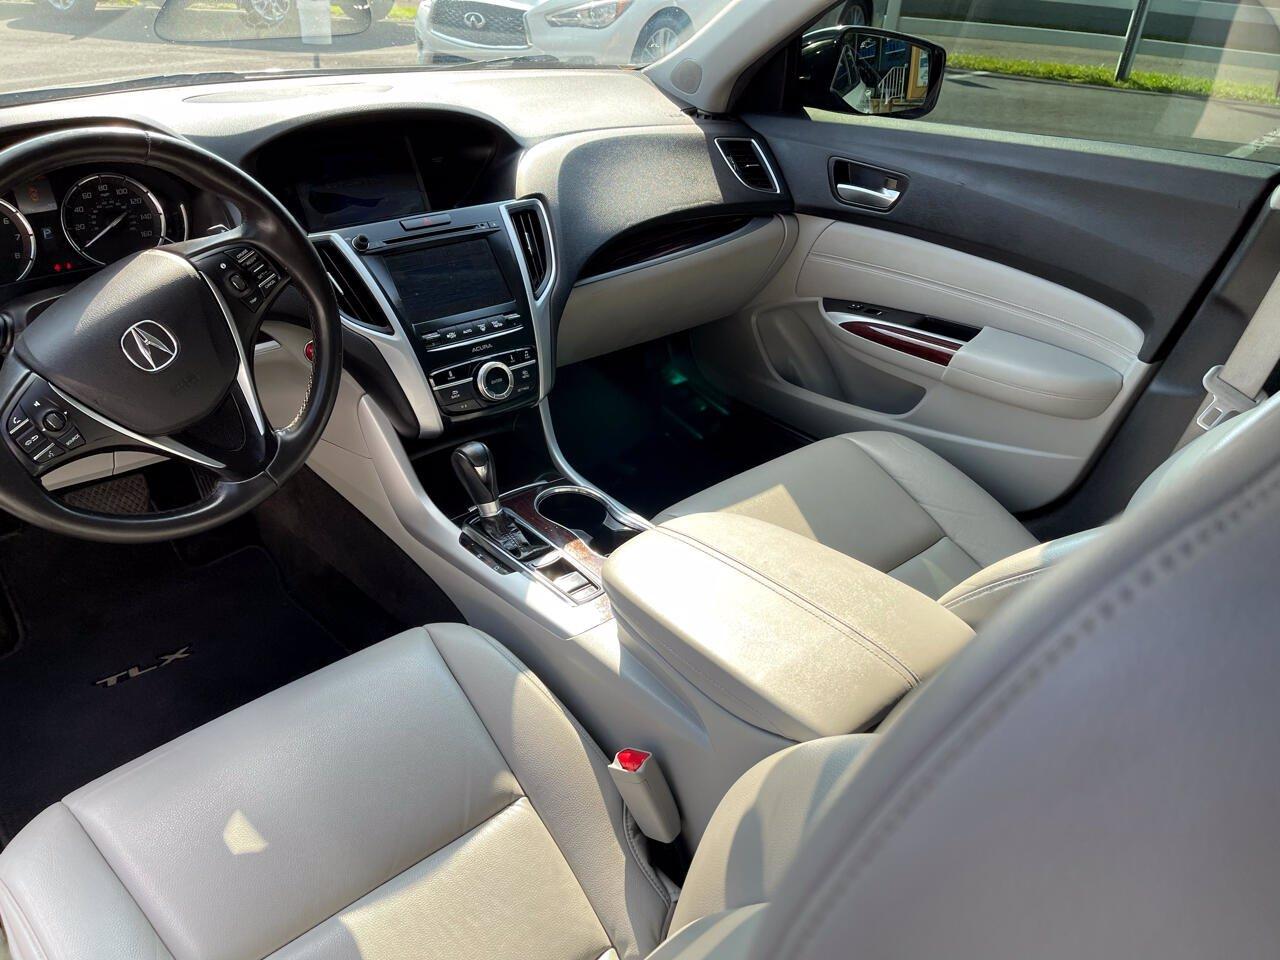 2015 Acura TLX